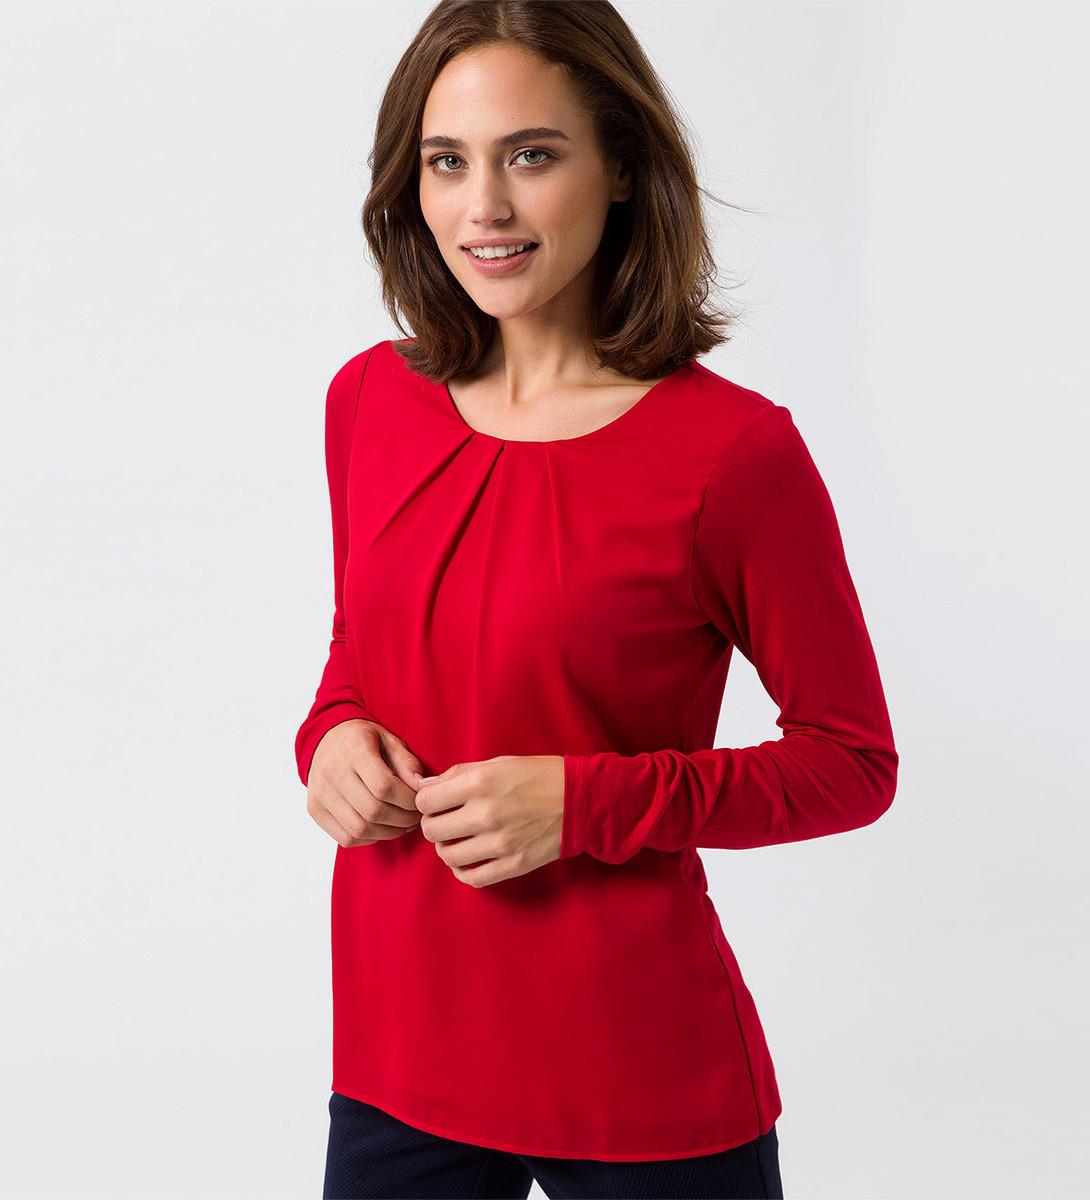 Blusenshirt in tango red